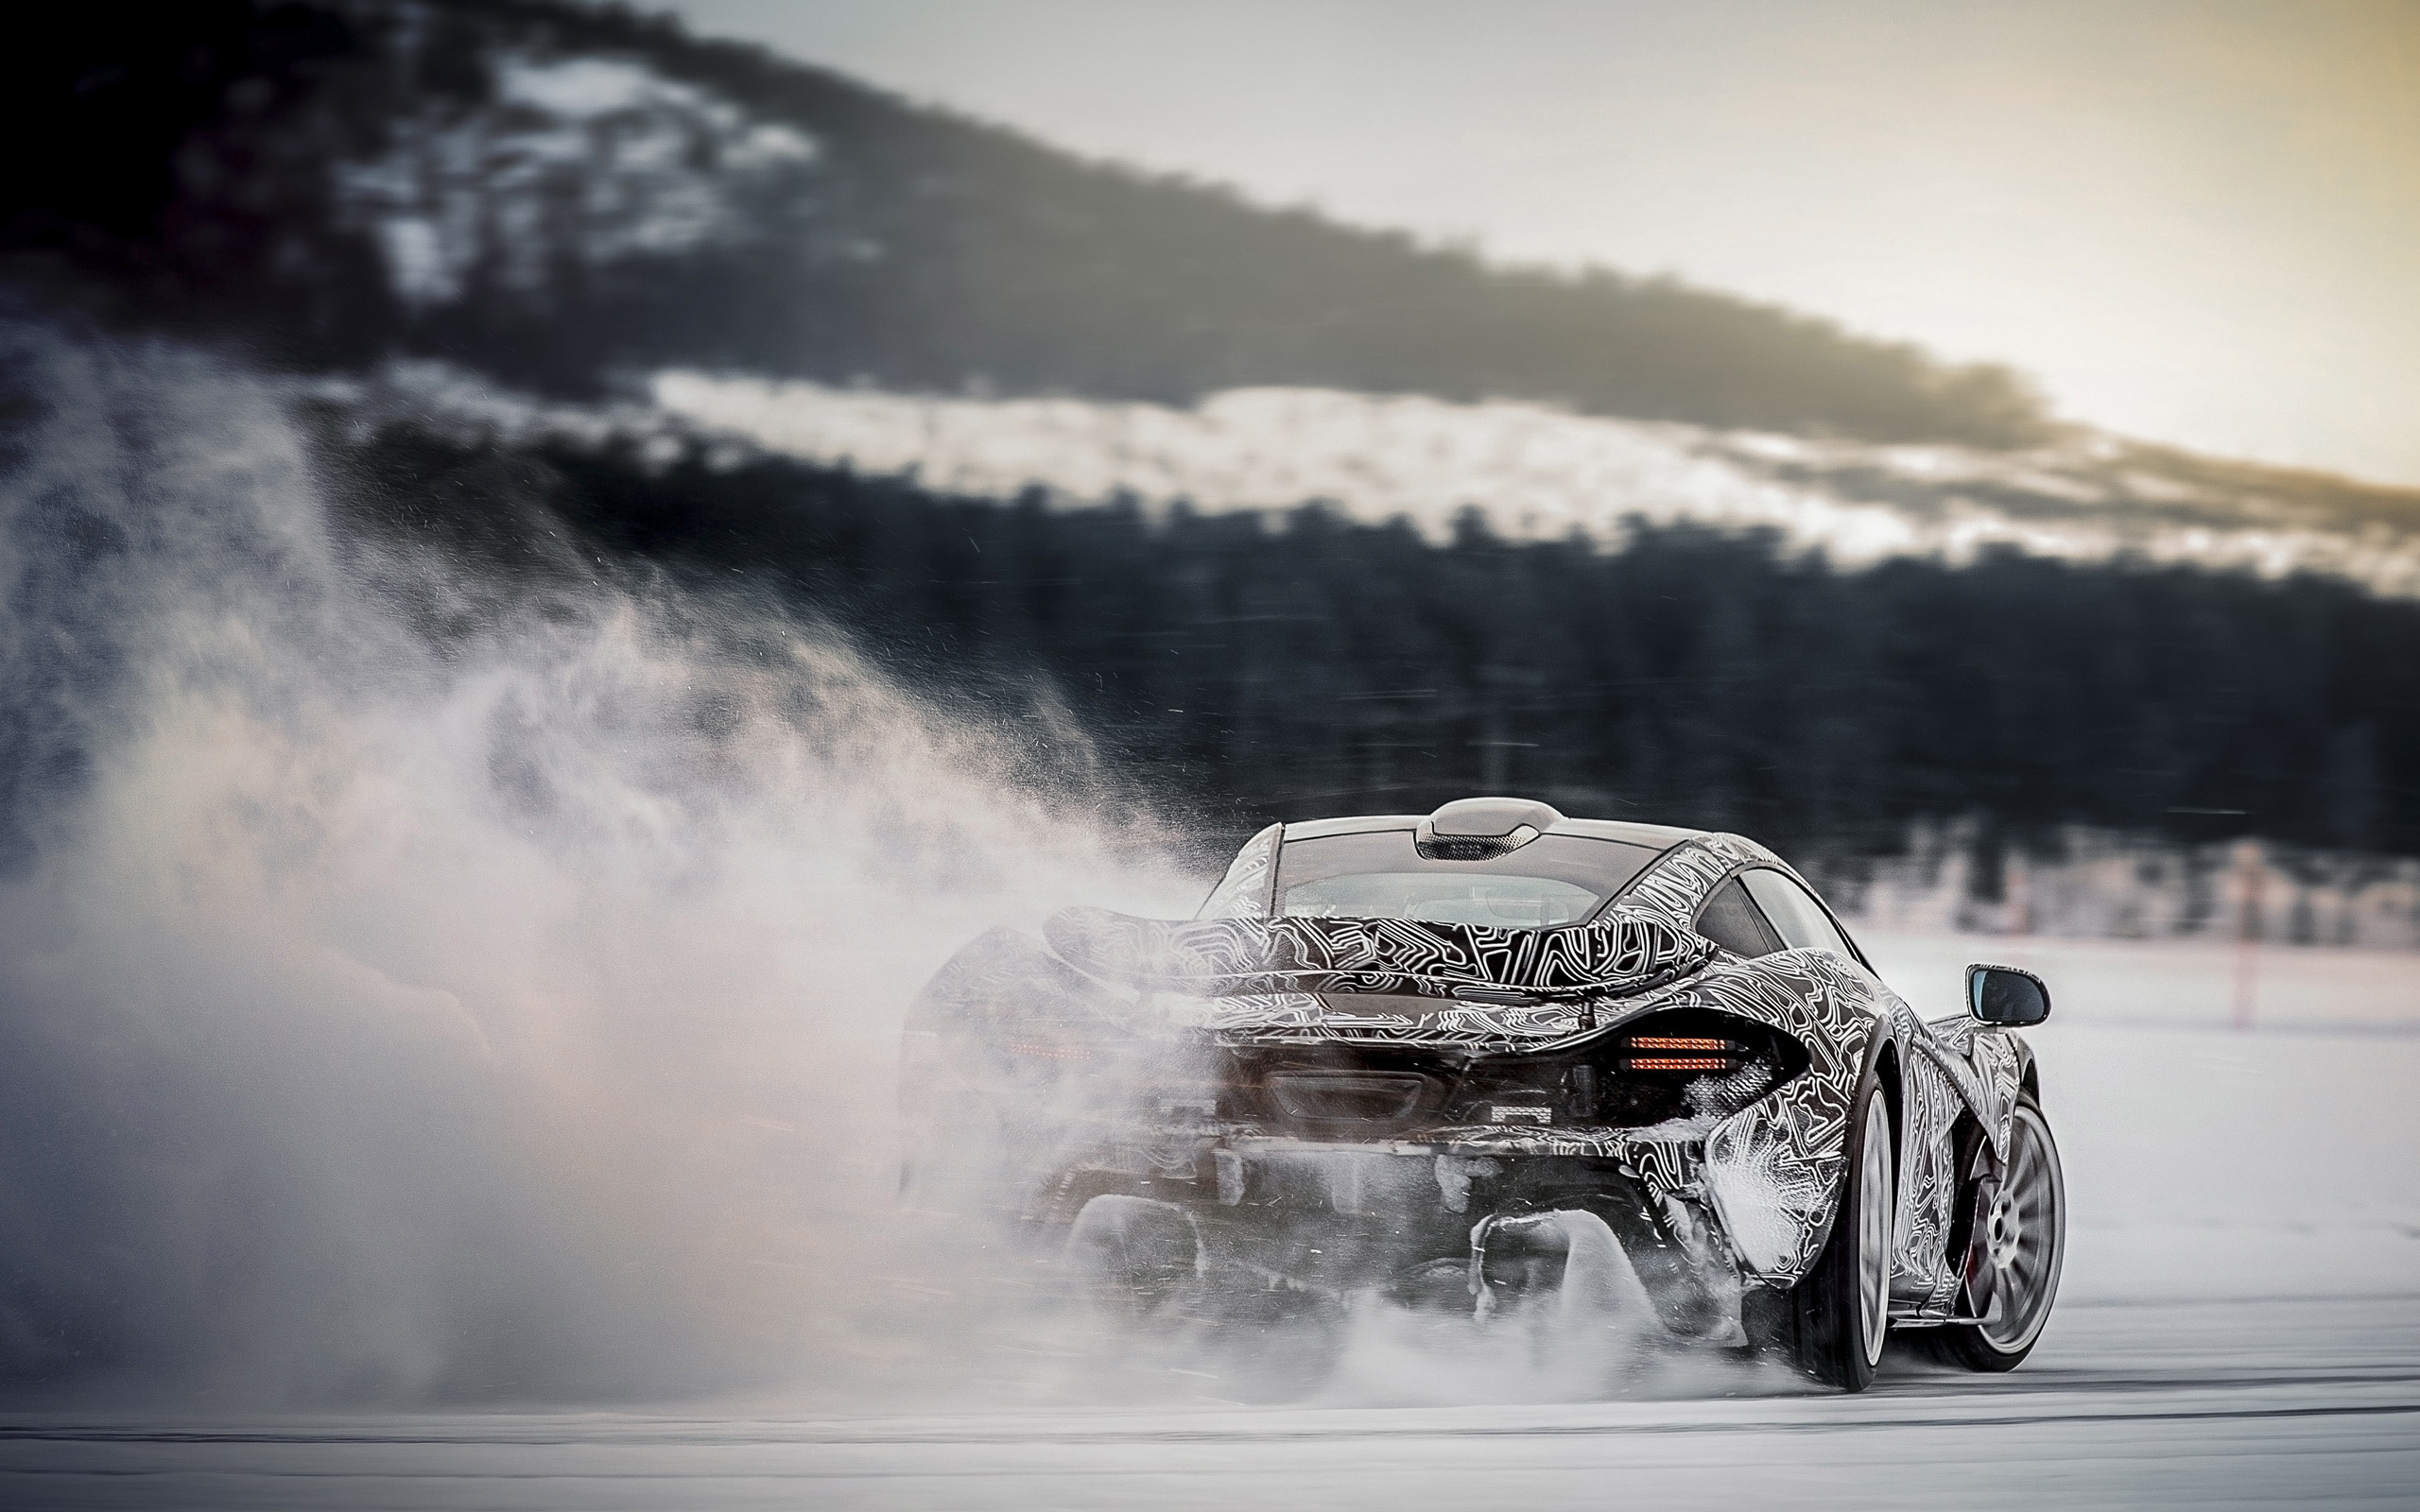 Mclaren P1 Ice Drifting HD Wallpaper | Background Image ...